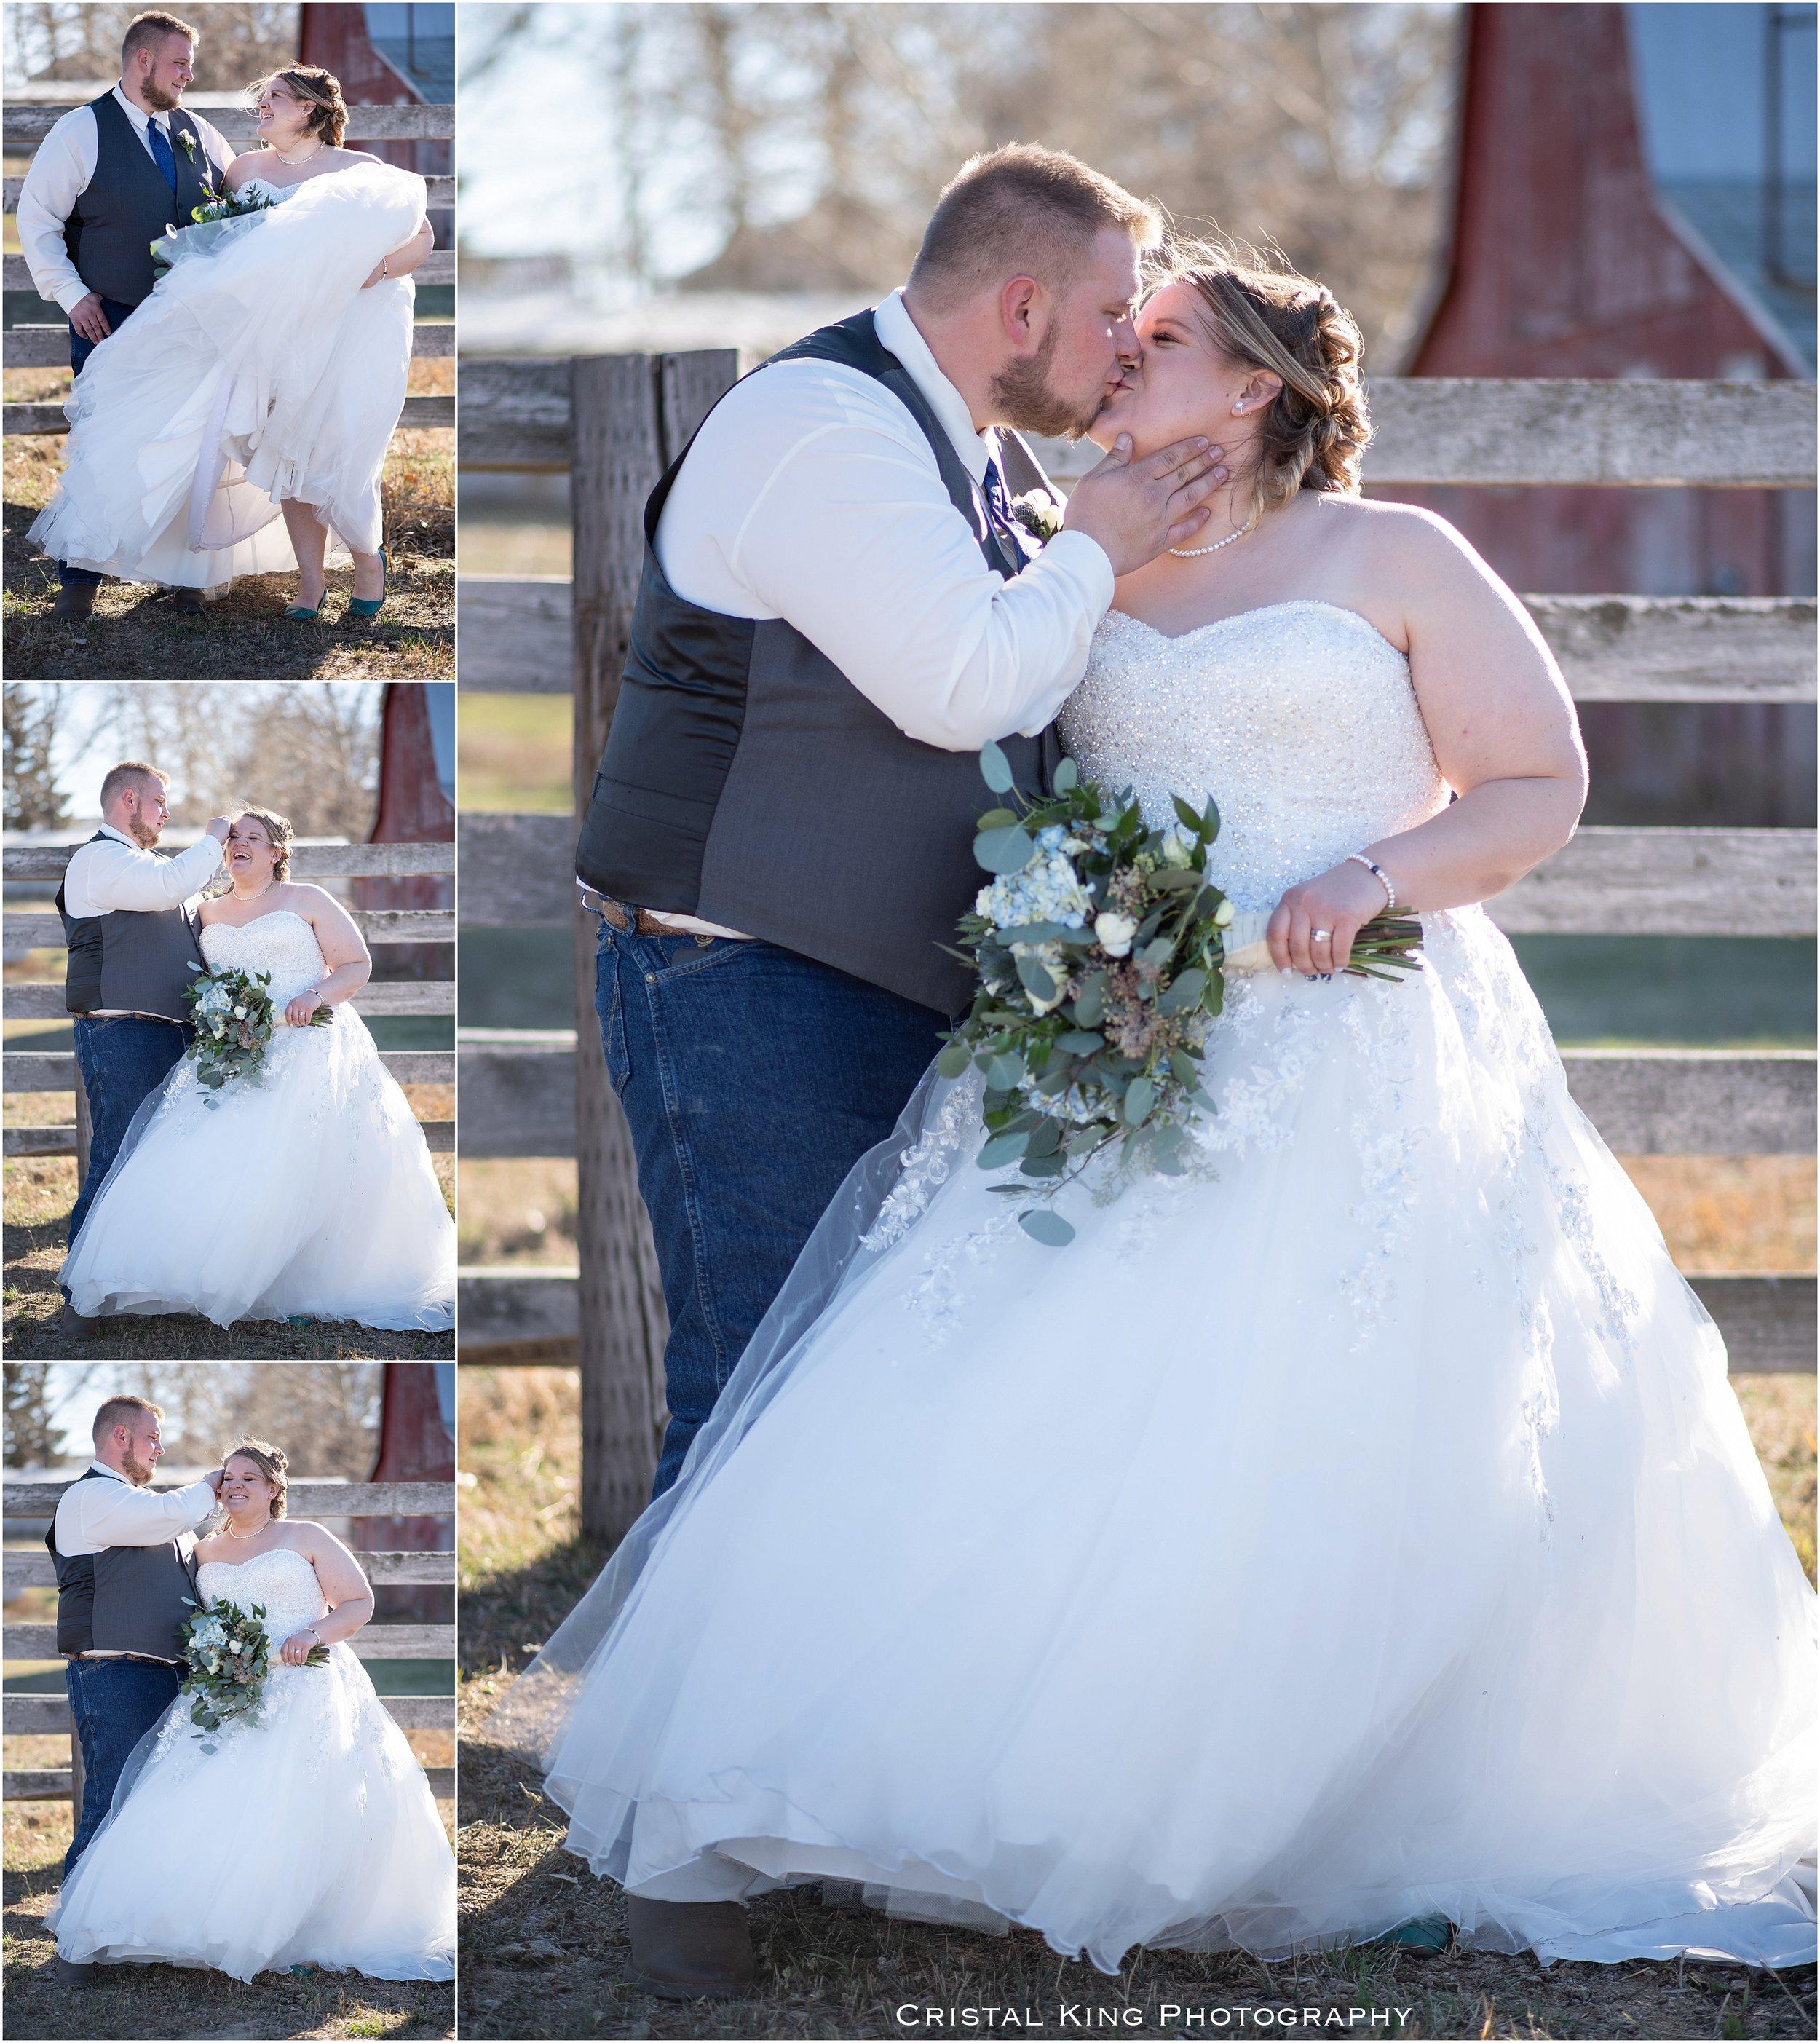 Tracy-Kyles-Wedding-96.jpg